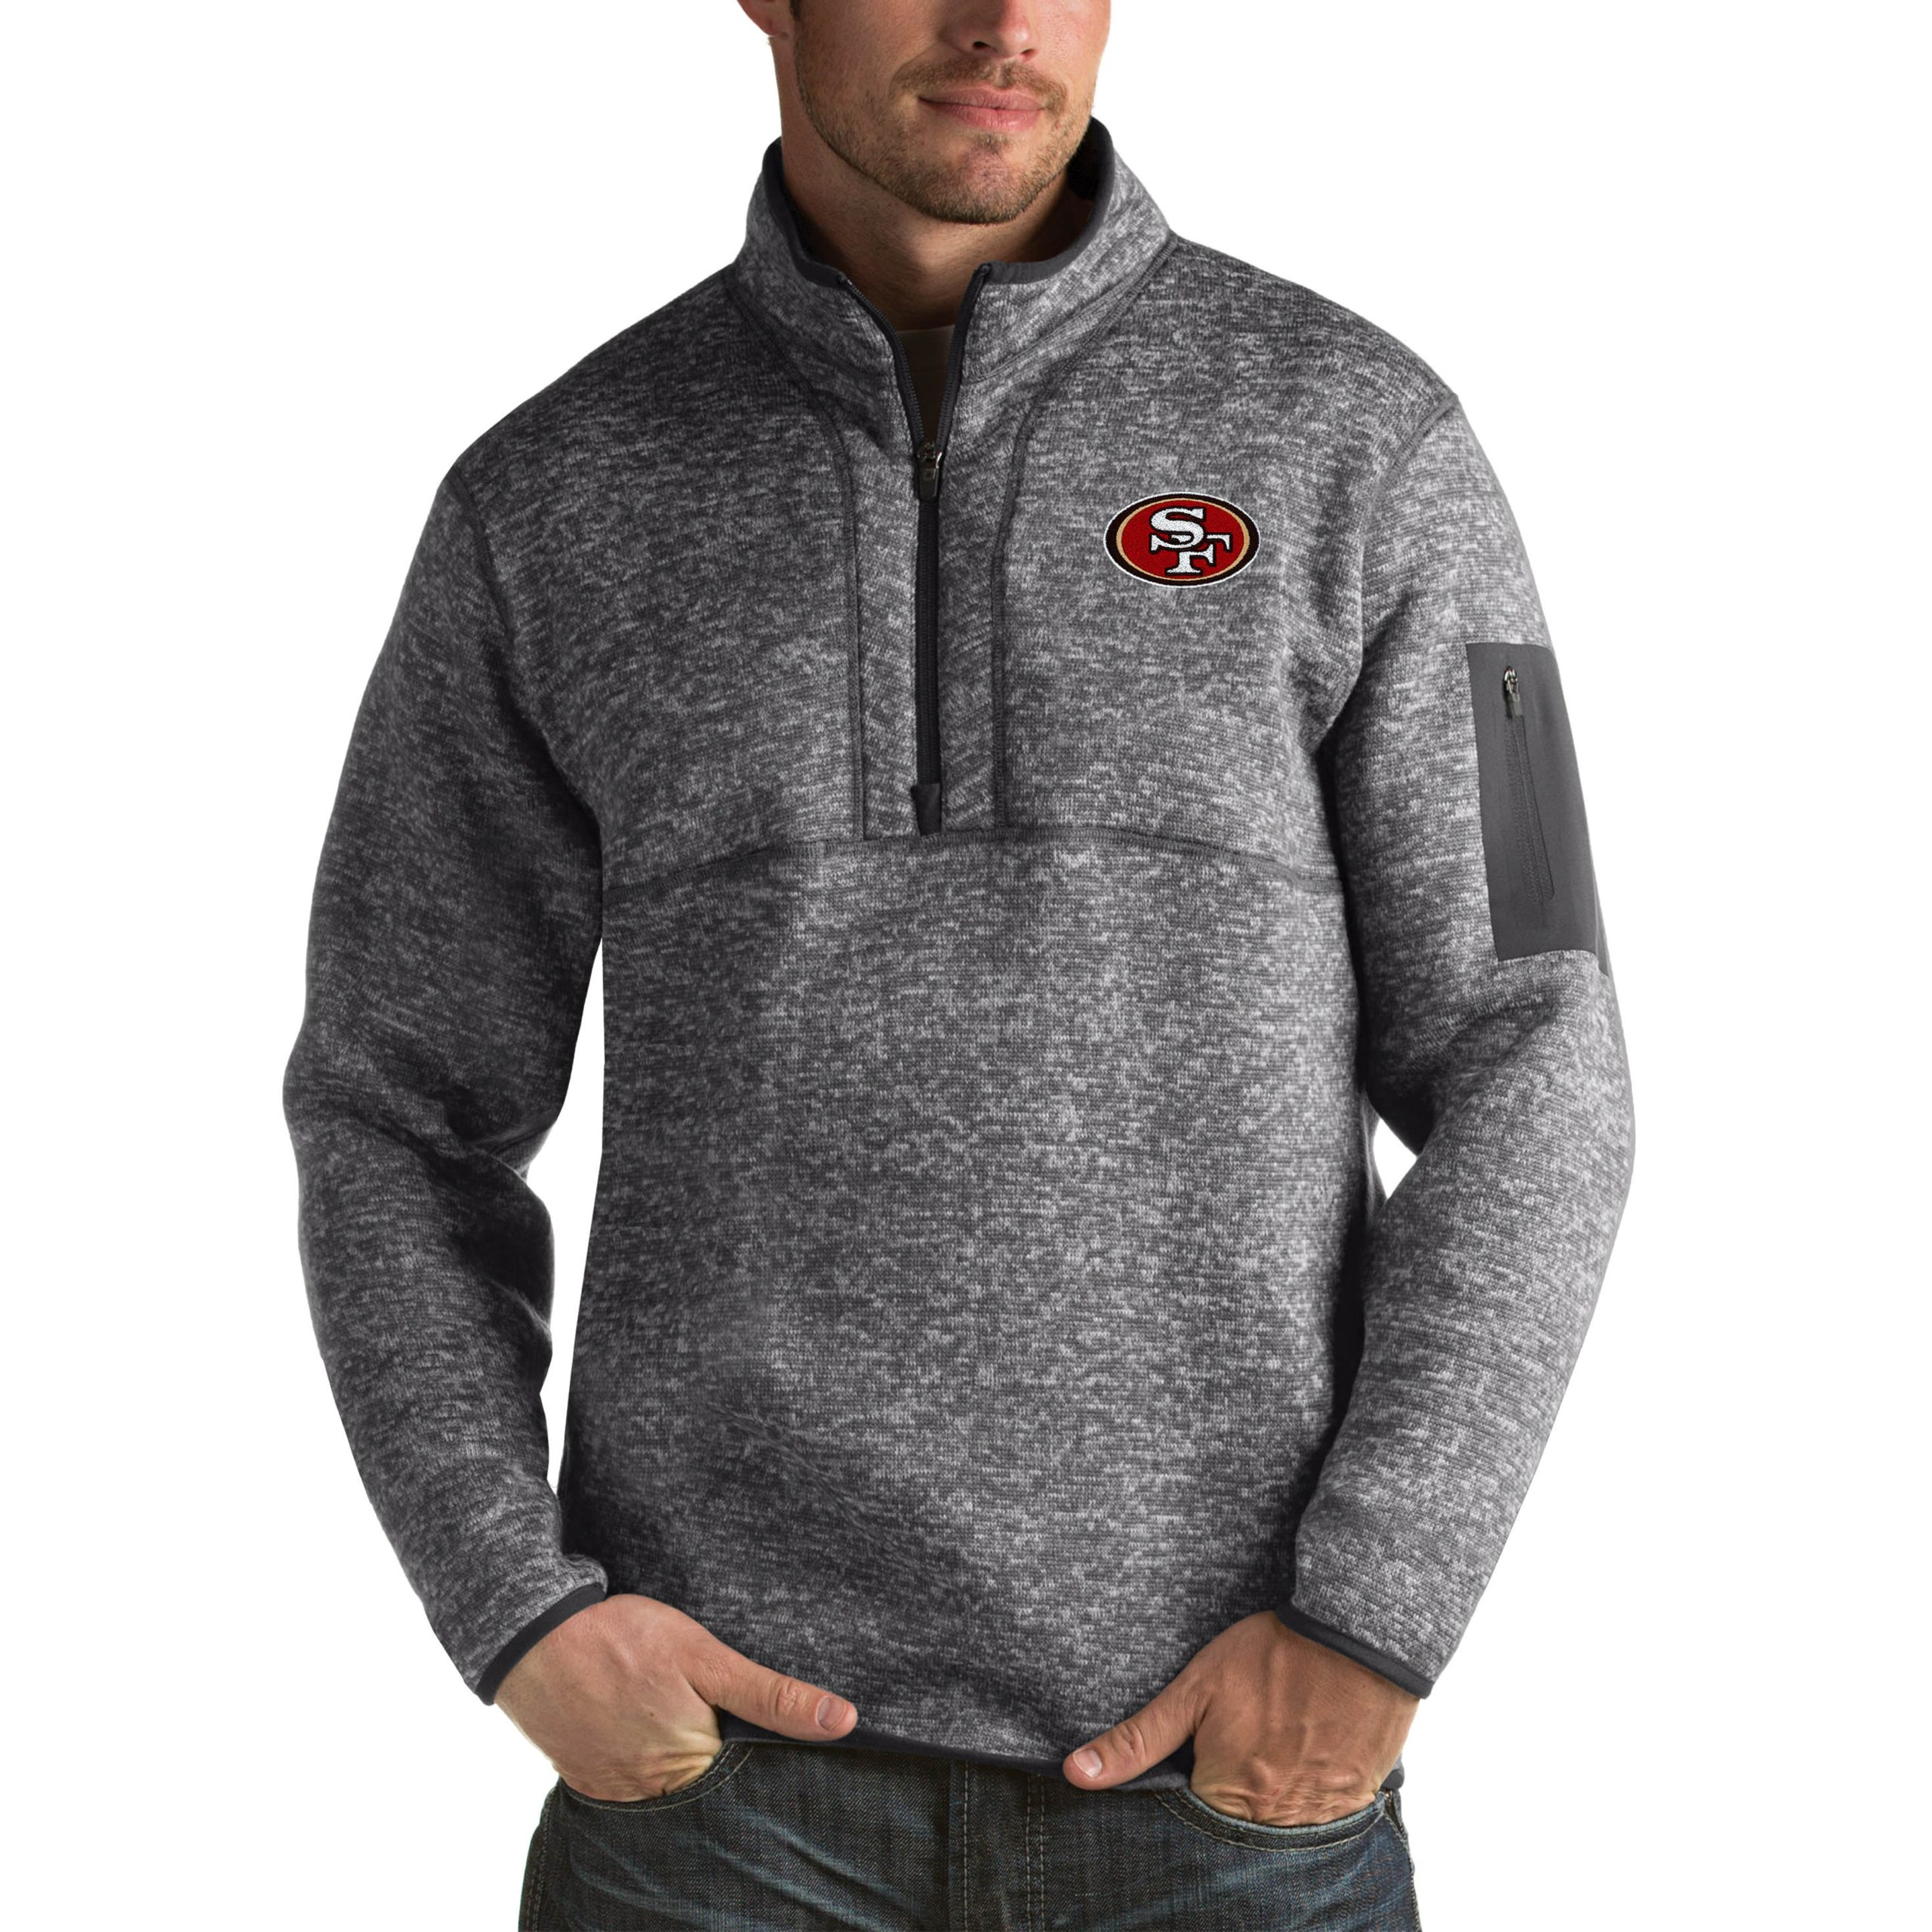 San Francisco 49ers Antigua Fortune Big & Tall Quarter-Zip Pullover Jacket - Charcoal